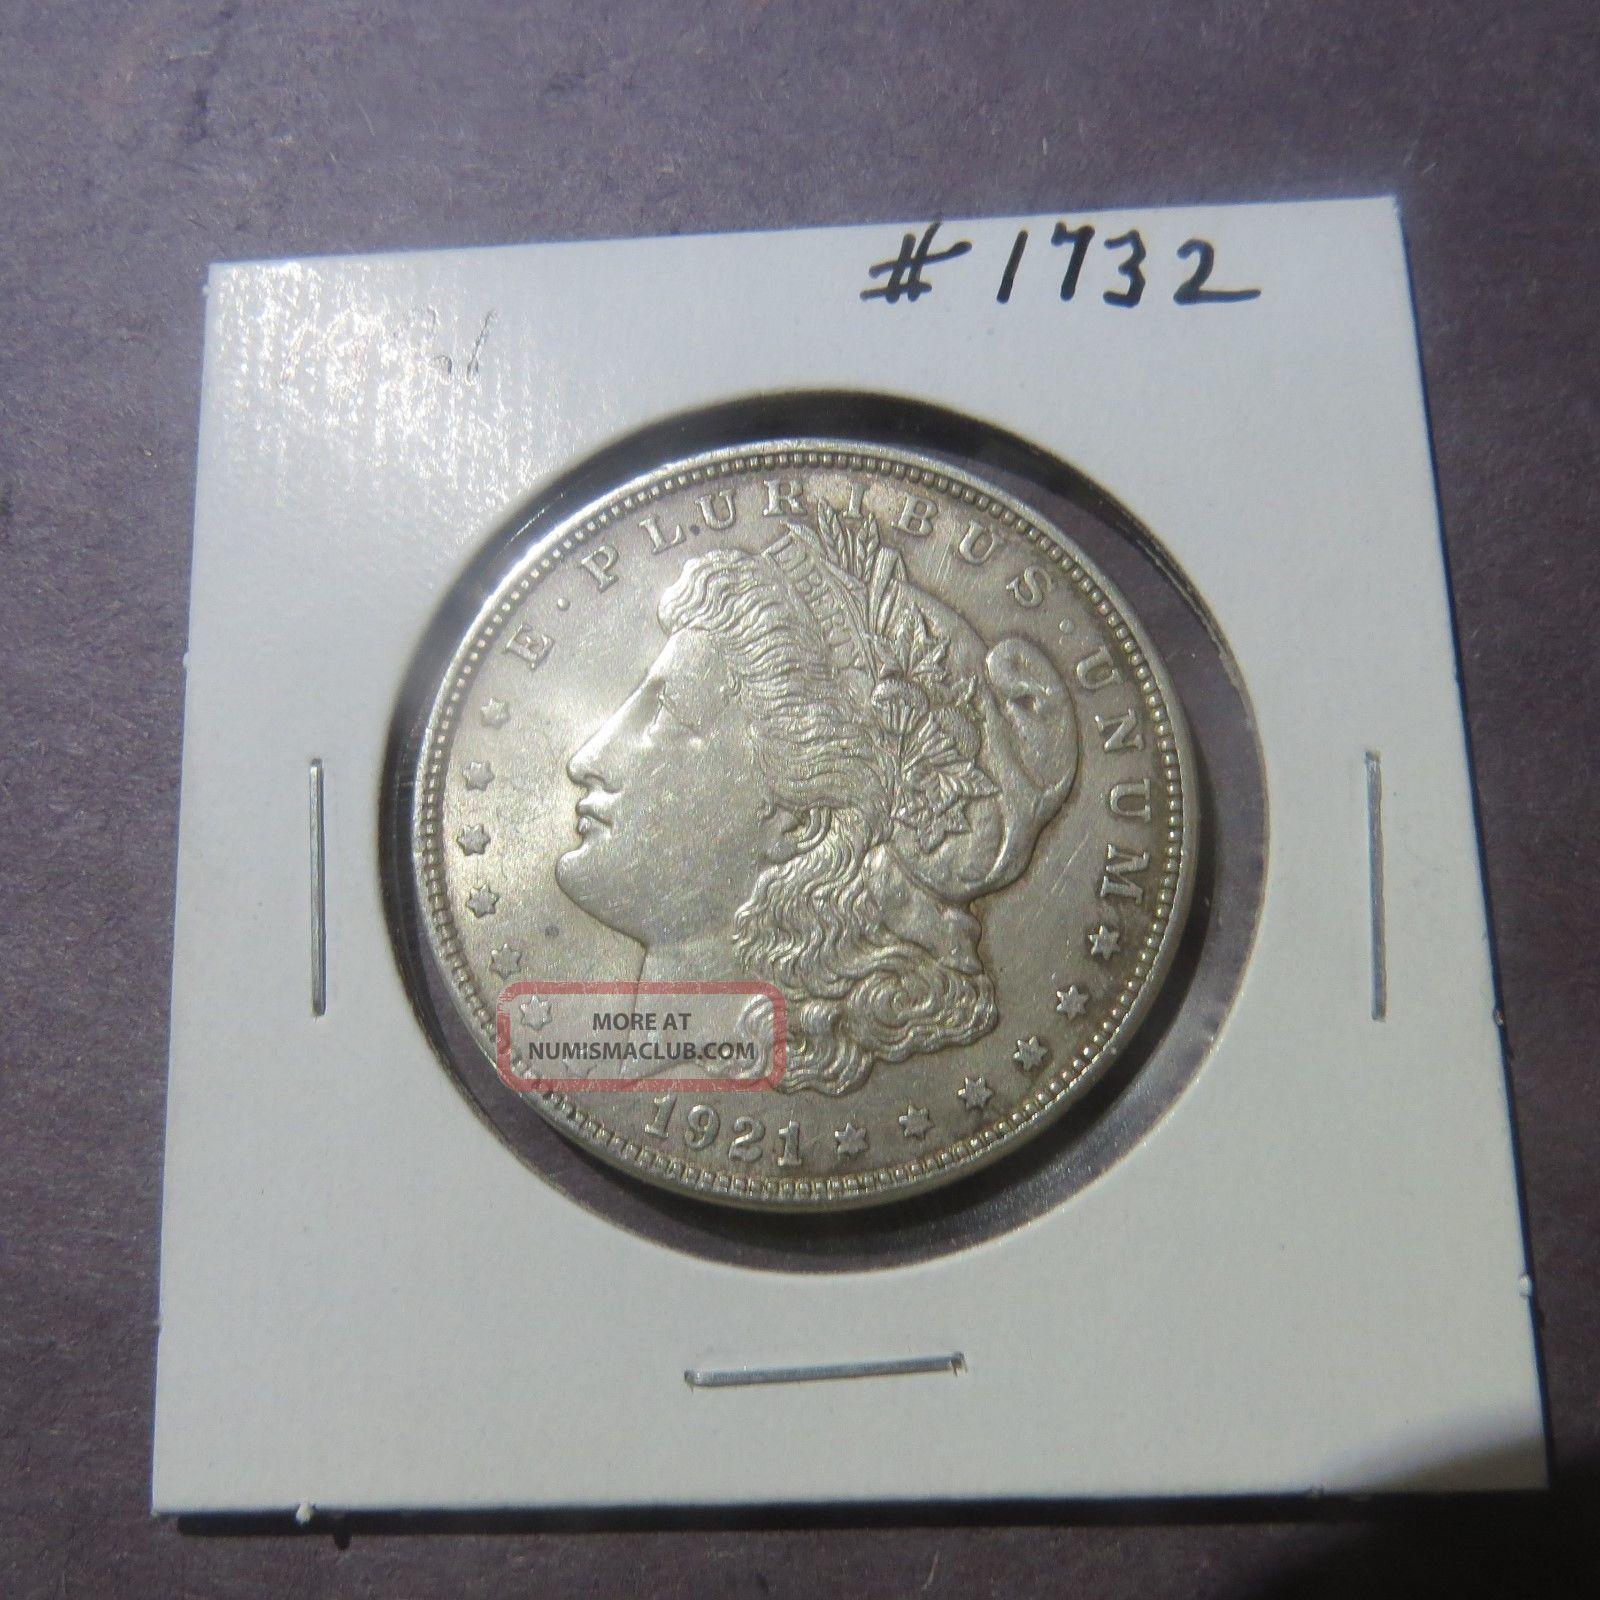 1921 $1 Morgan Silver Dollar 1732 Morgan (1878-1921) photo